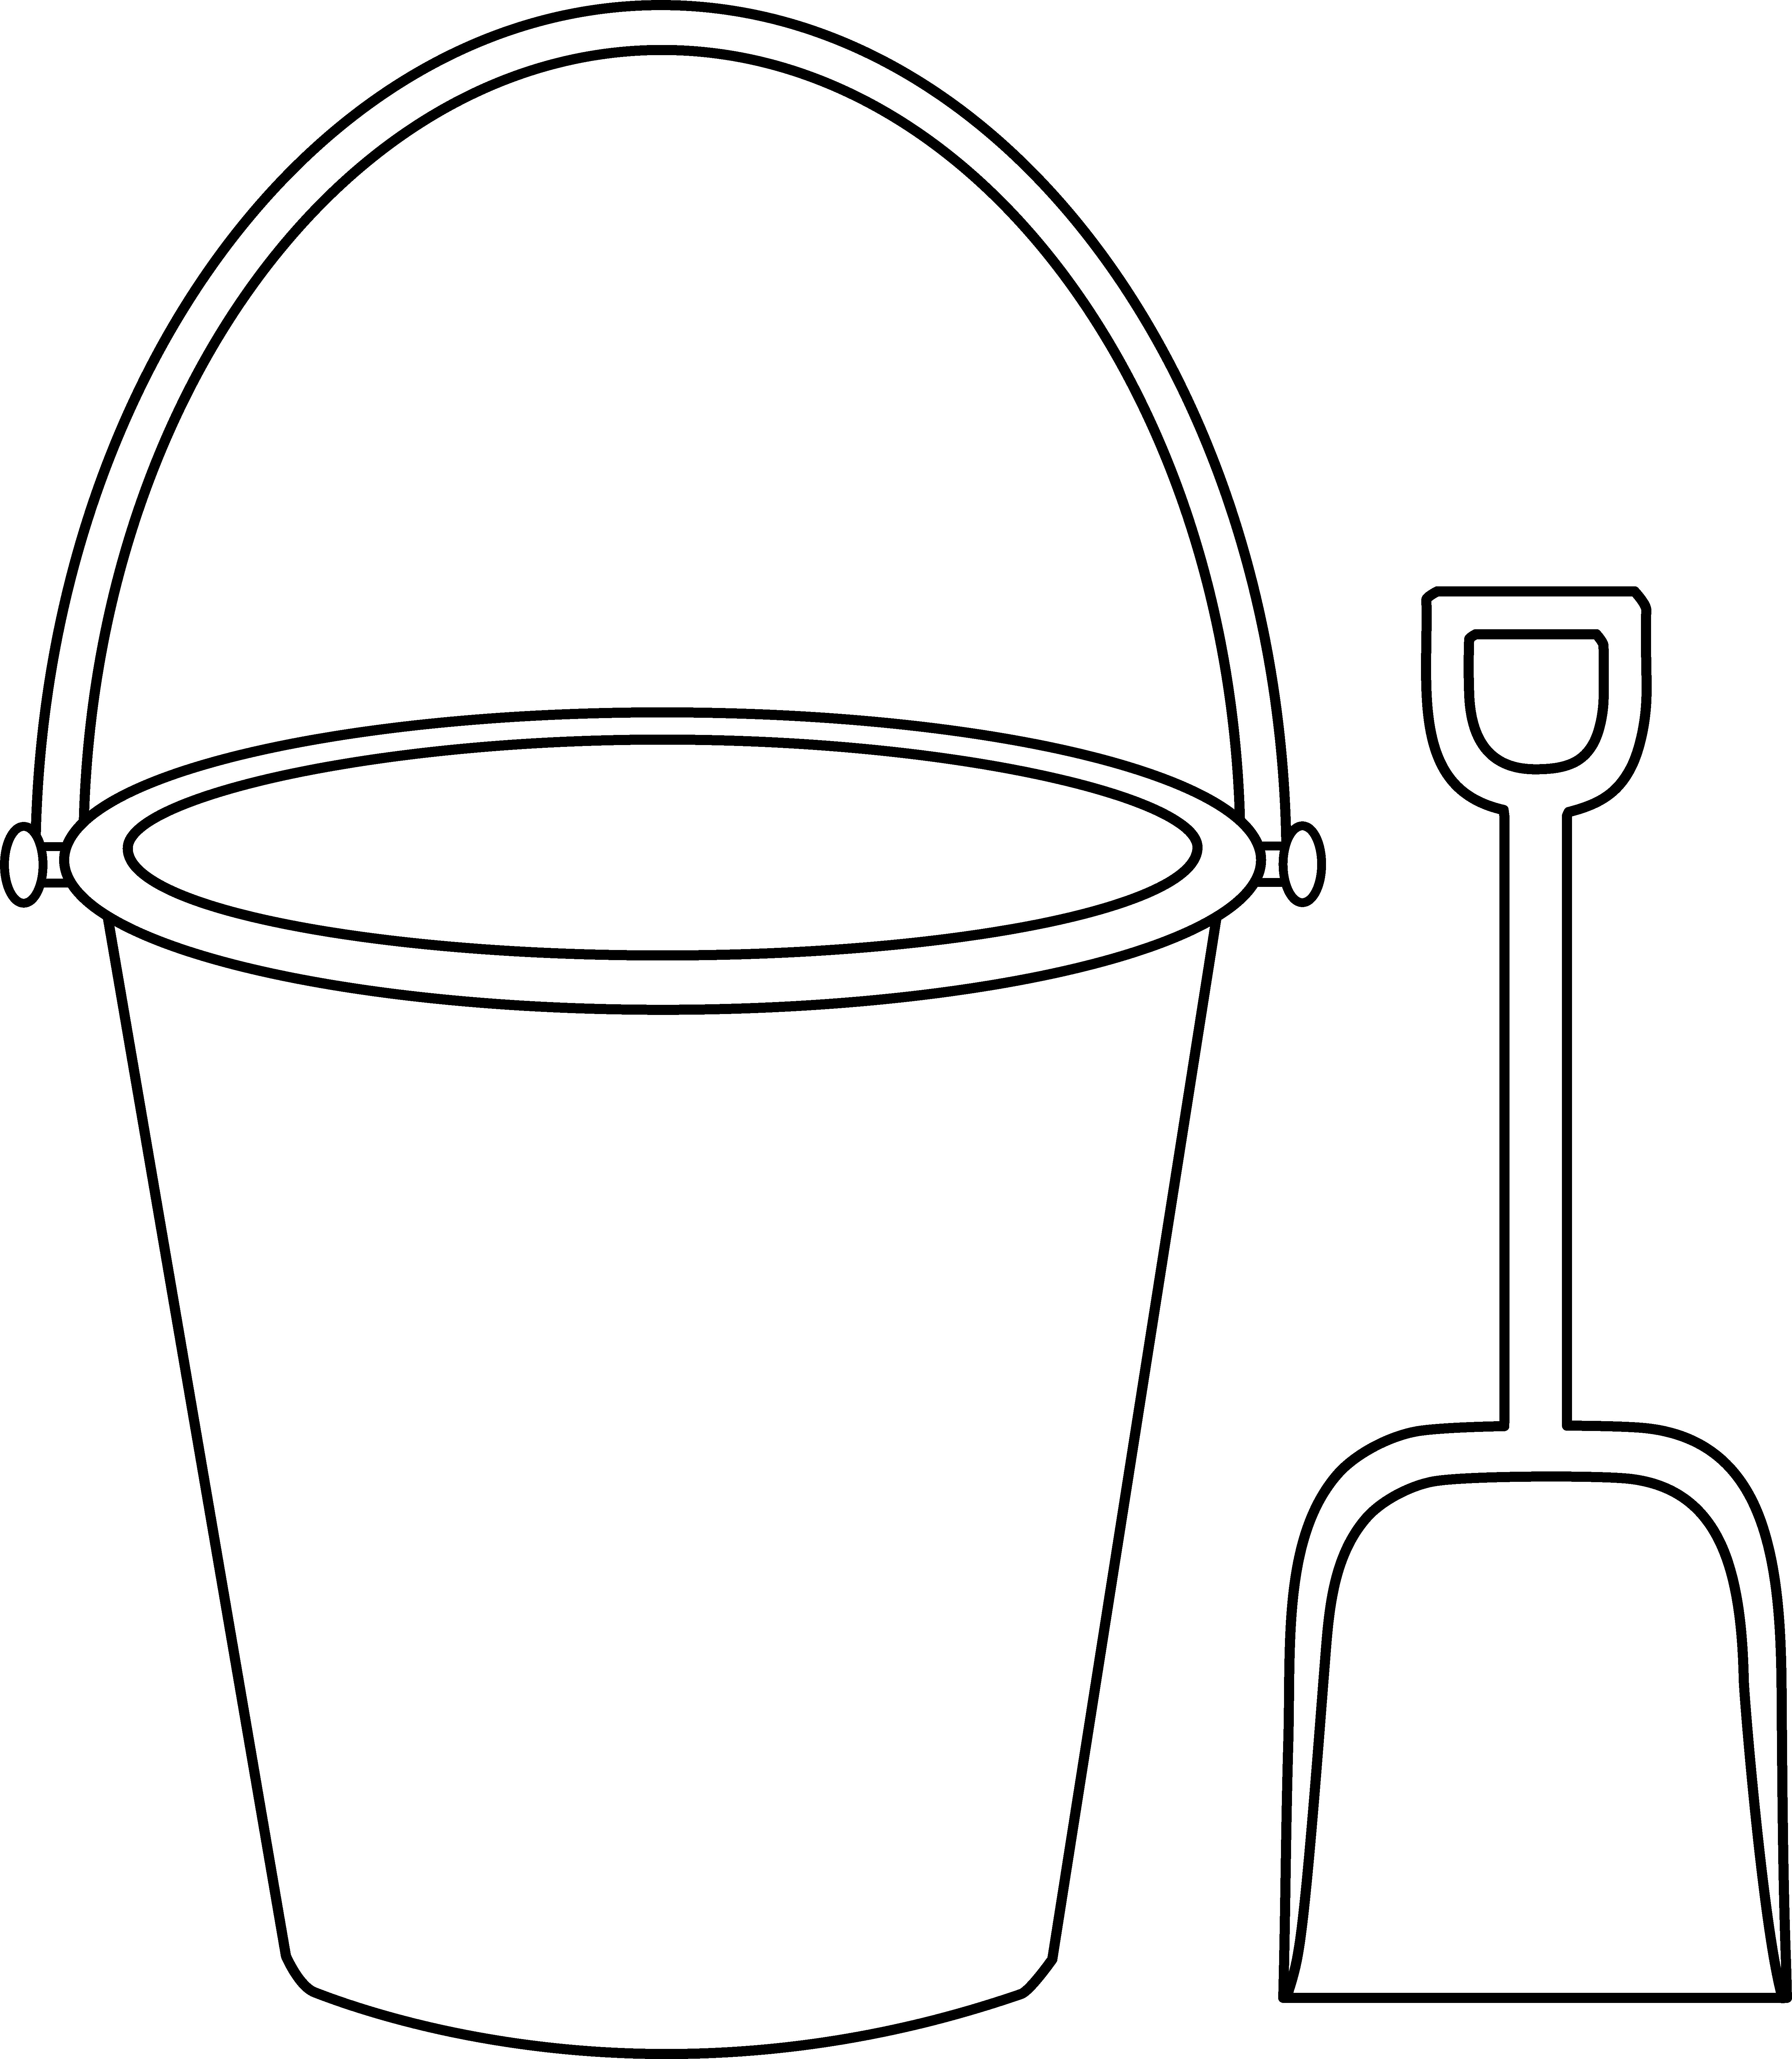 Bucket and Shovel Outline.